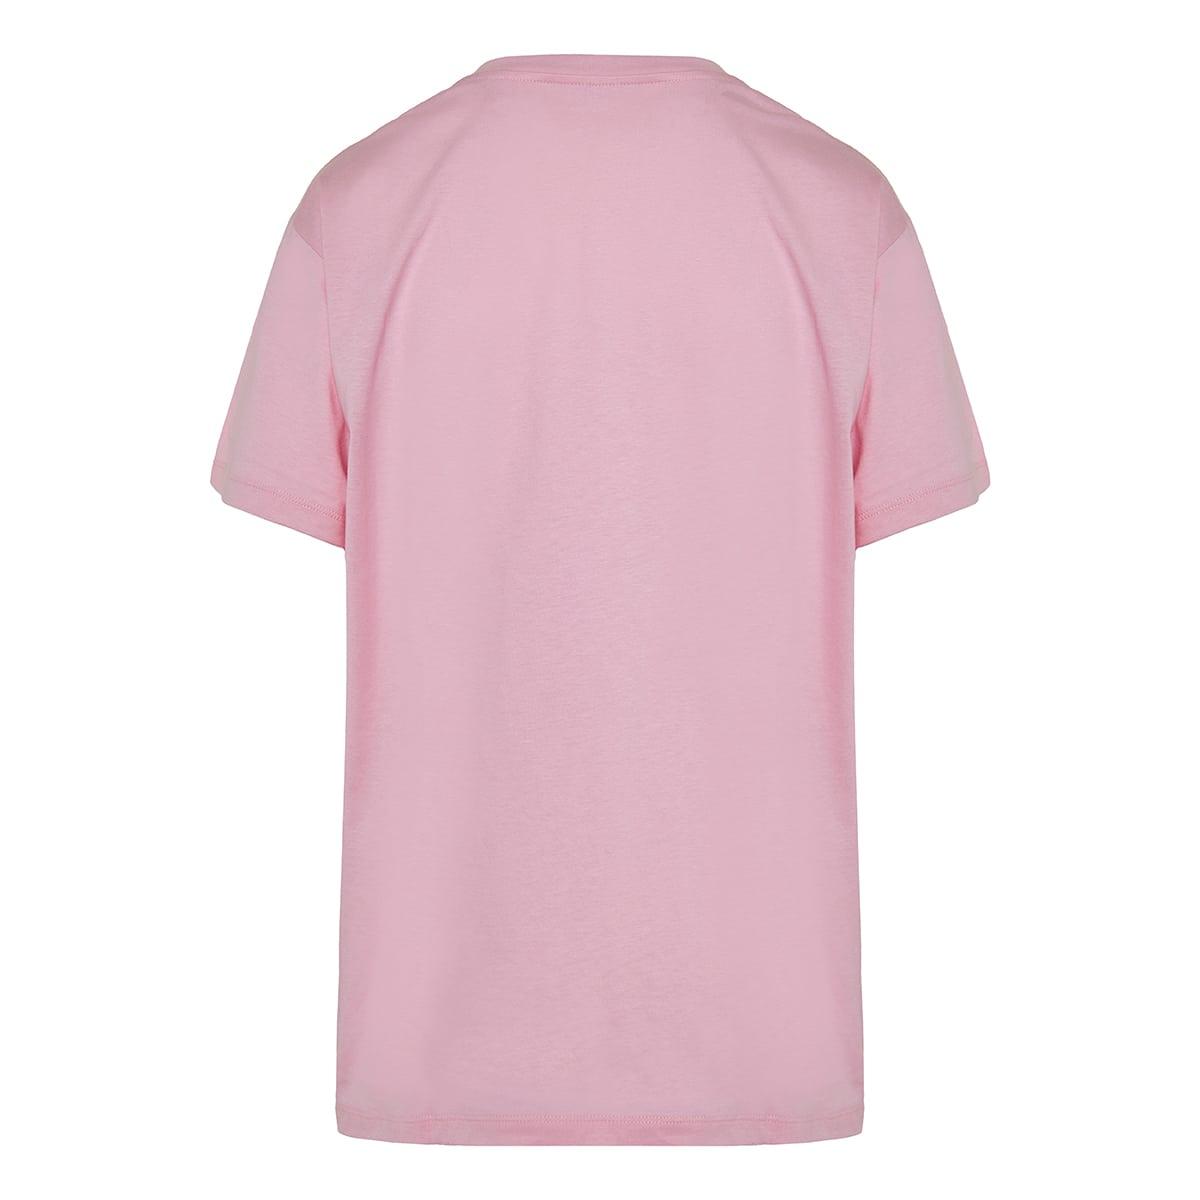 Bananya oversized cotton t-shirt